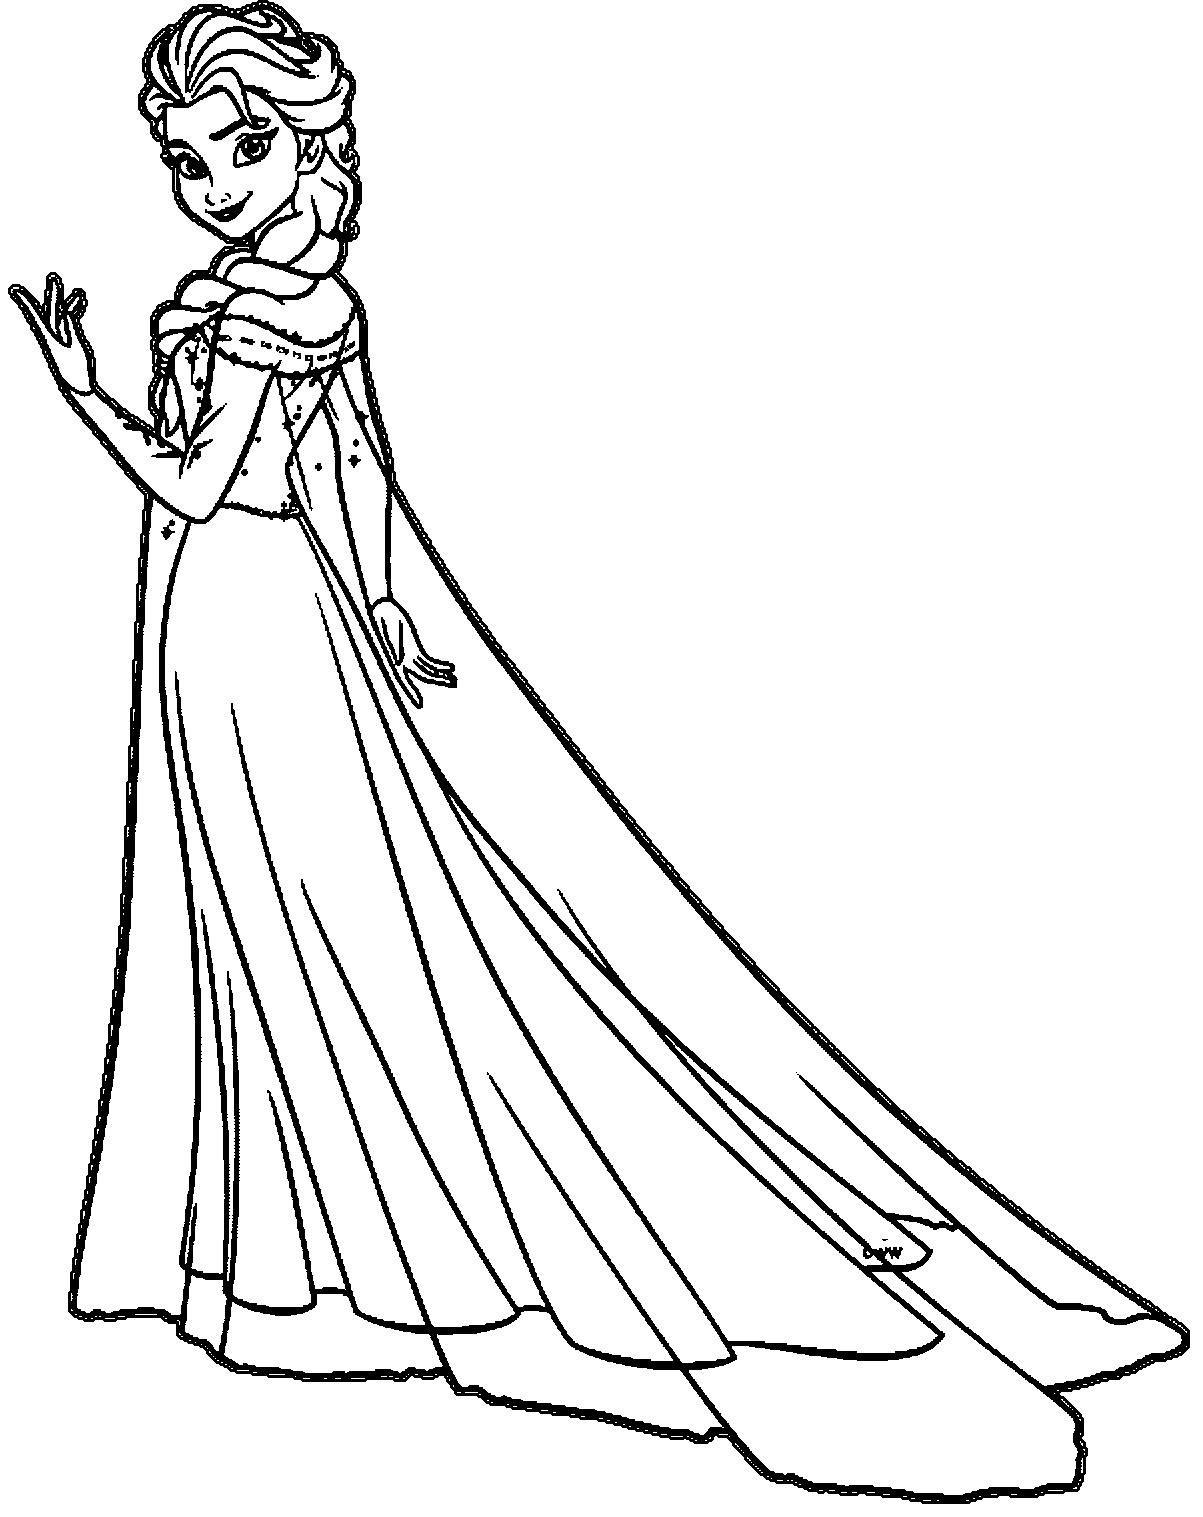 18 Coloring Pages Princess Elsa Princess Coloring Pages Elsa Coloring Pages Elsa Coloring